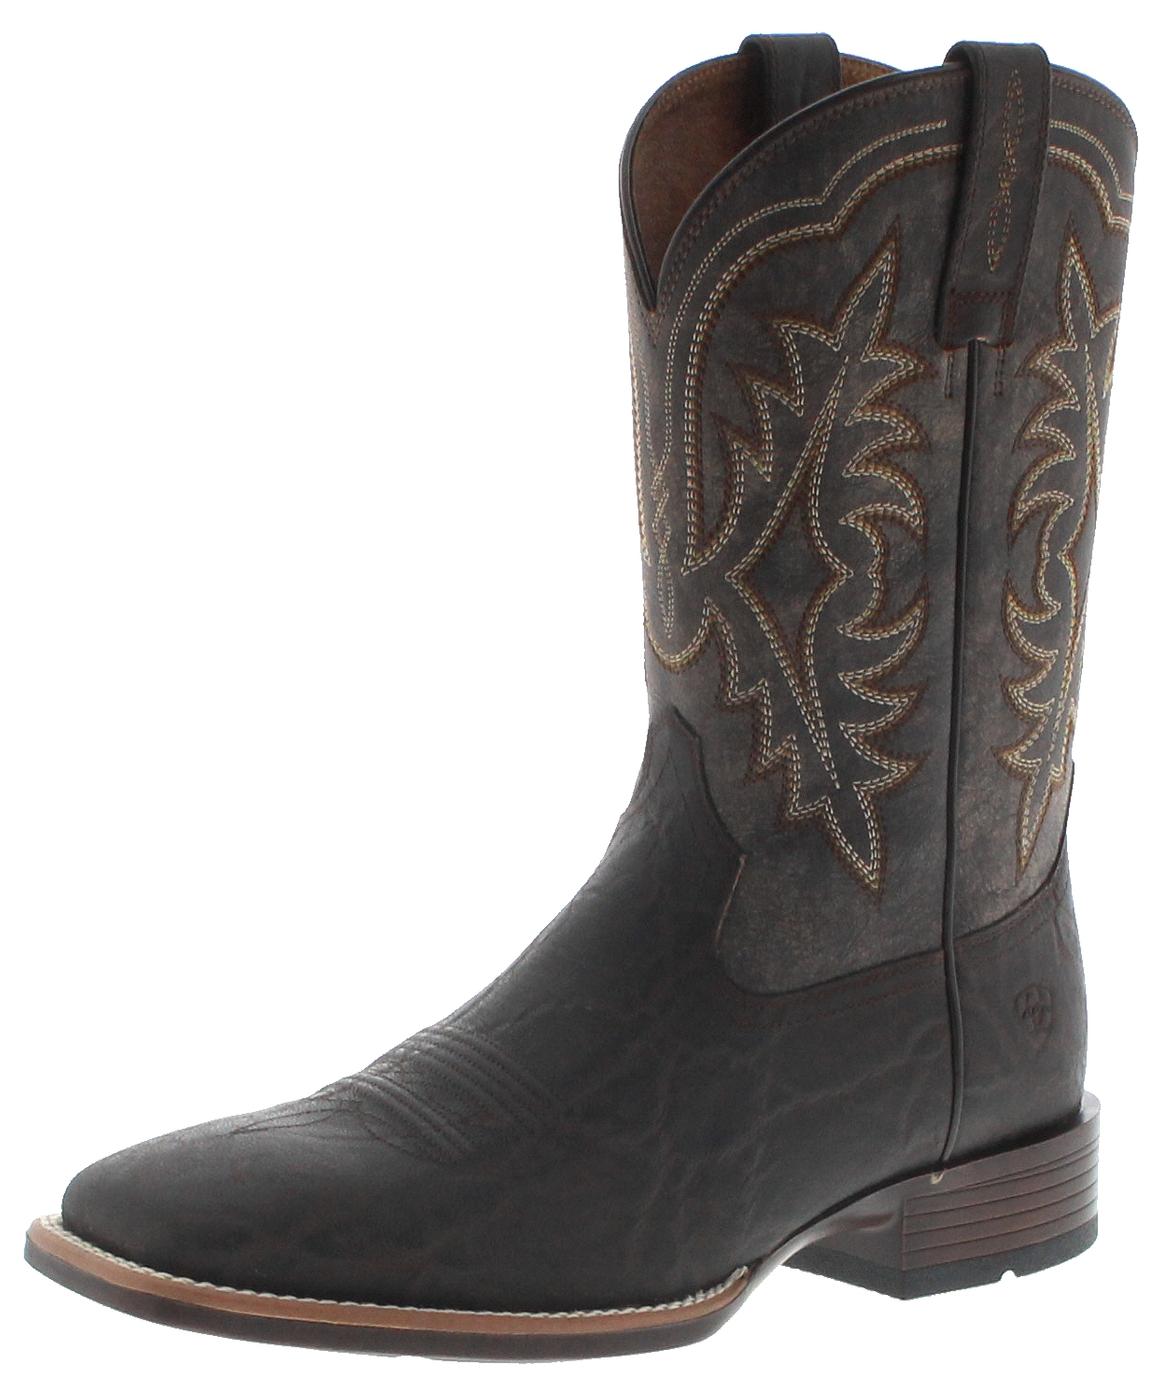 Ariat 29717 RYDEN ULTRA Chocolate Men's Western Riding Boots - brown